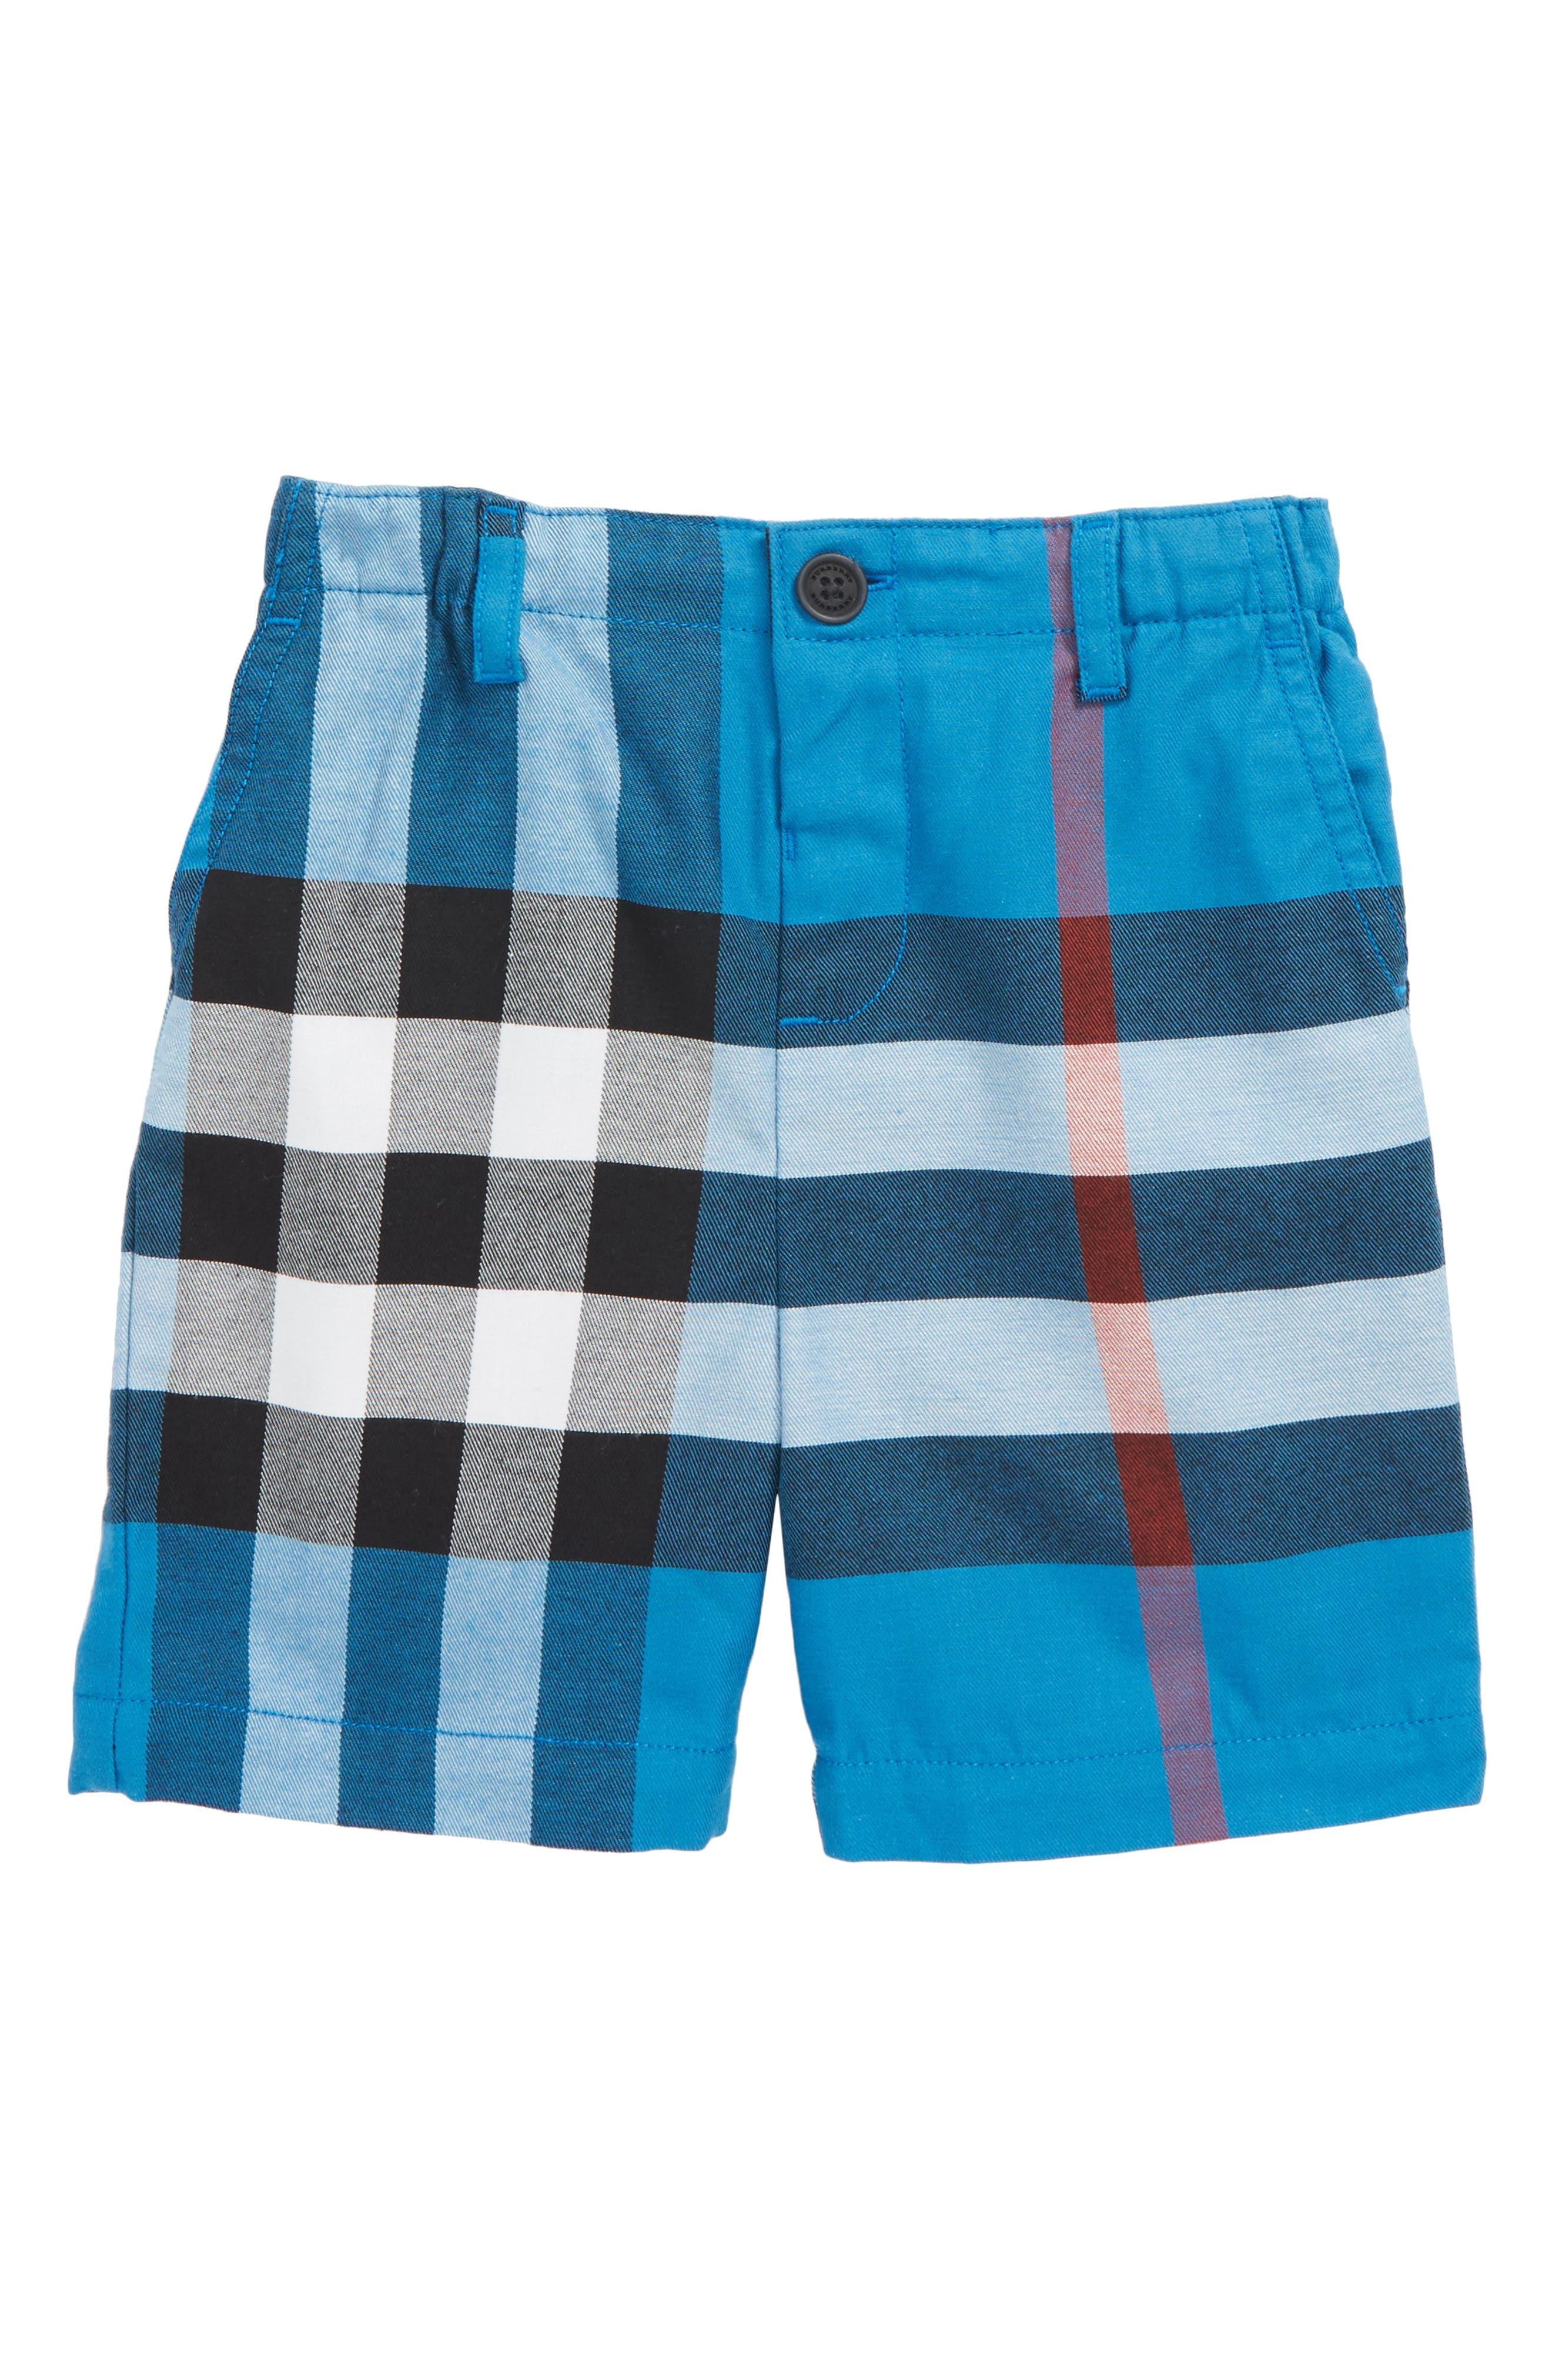 Sean Check Print Shorts,                             Main thumbnail 1, color,                             Azure Blue